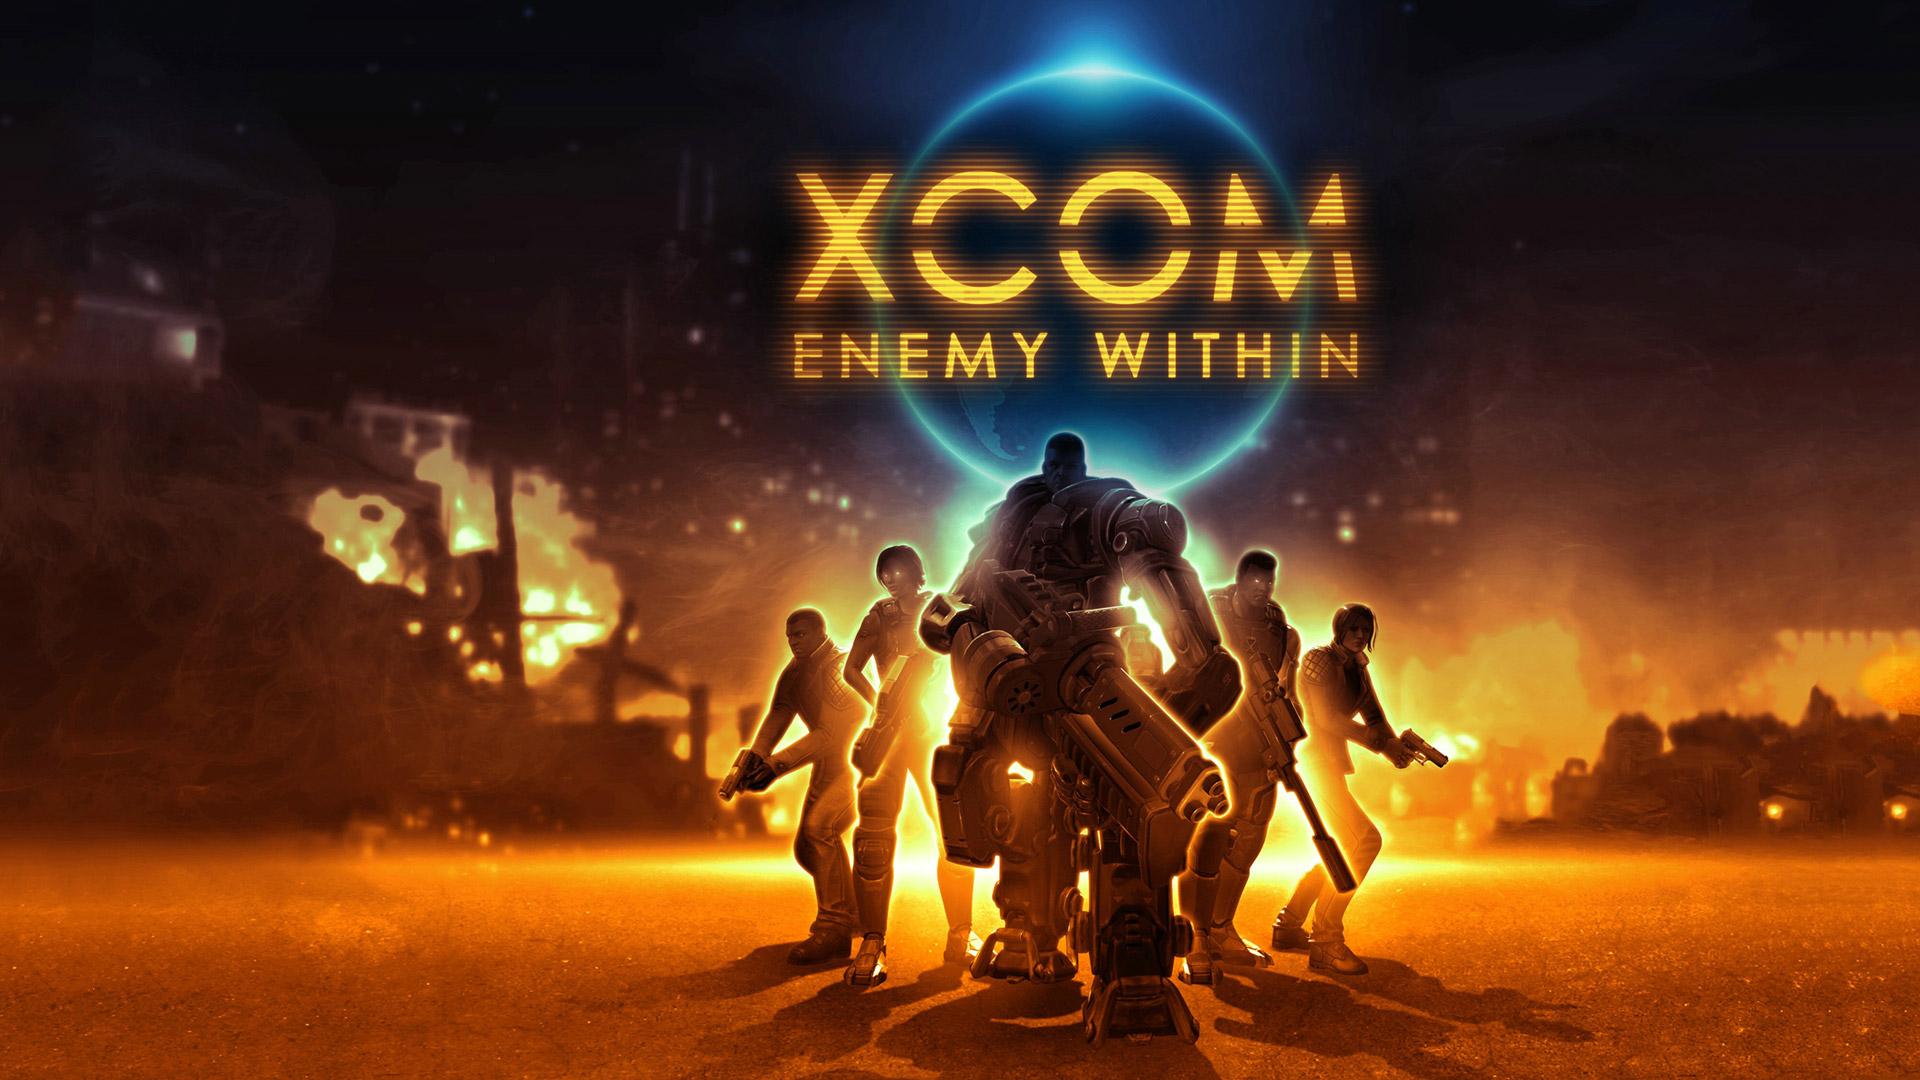 XCOM: Enemy Within Wallpaper in 1920x1080